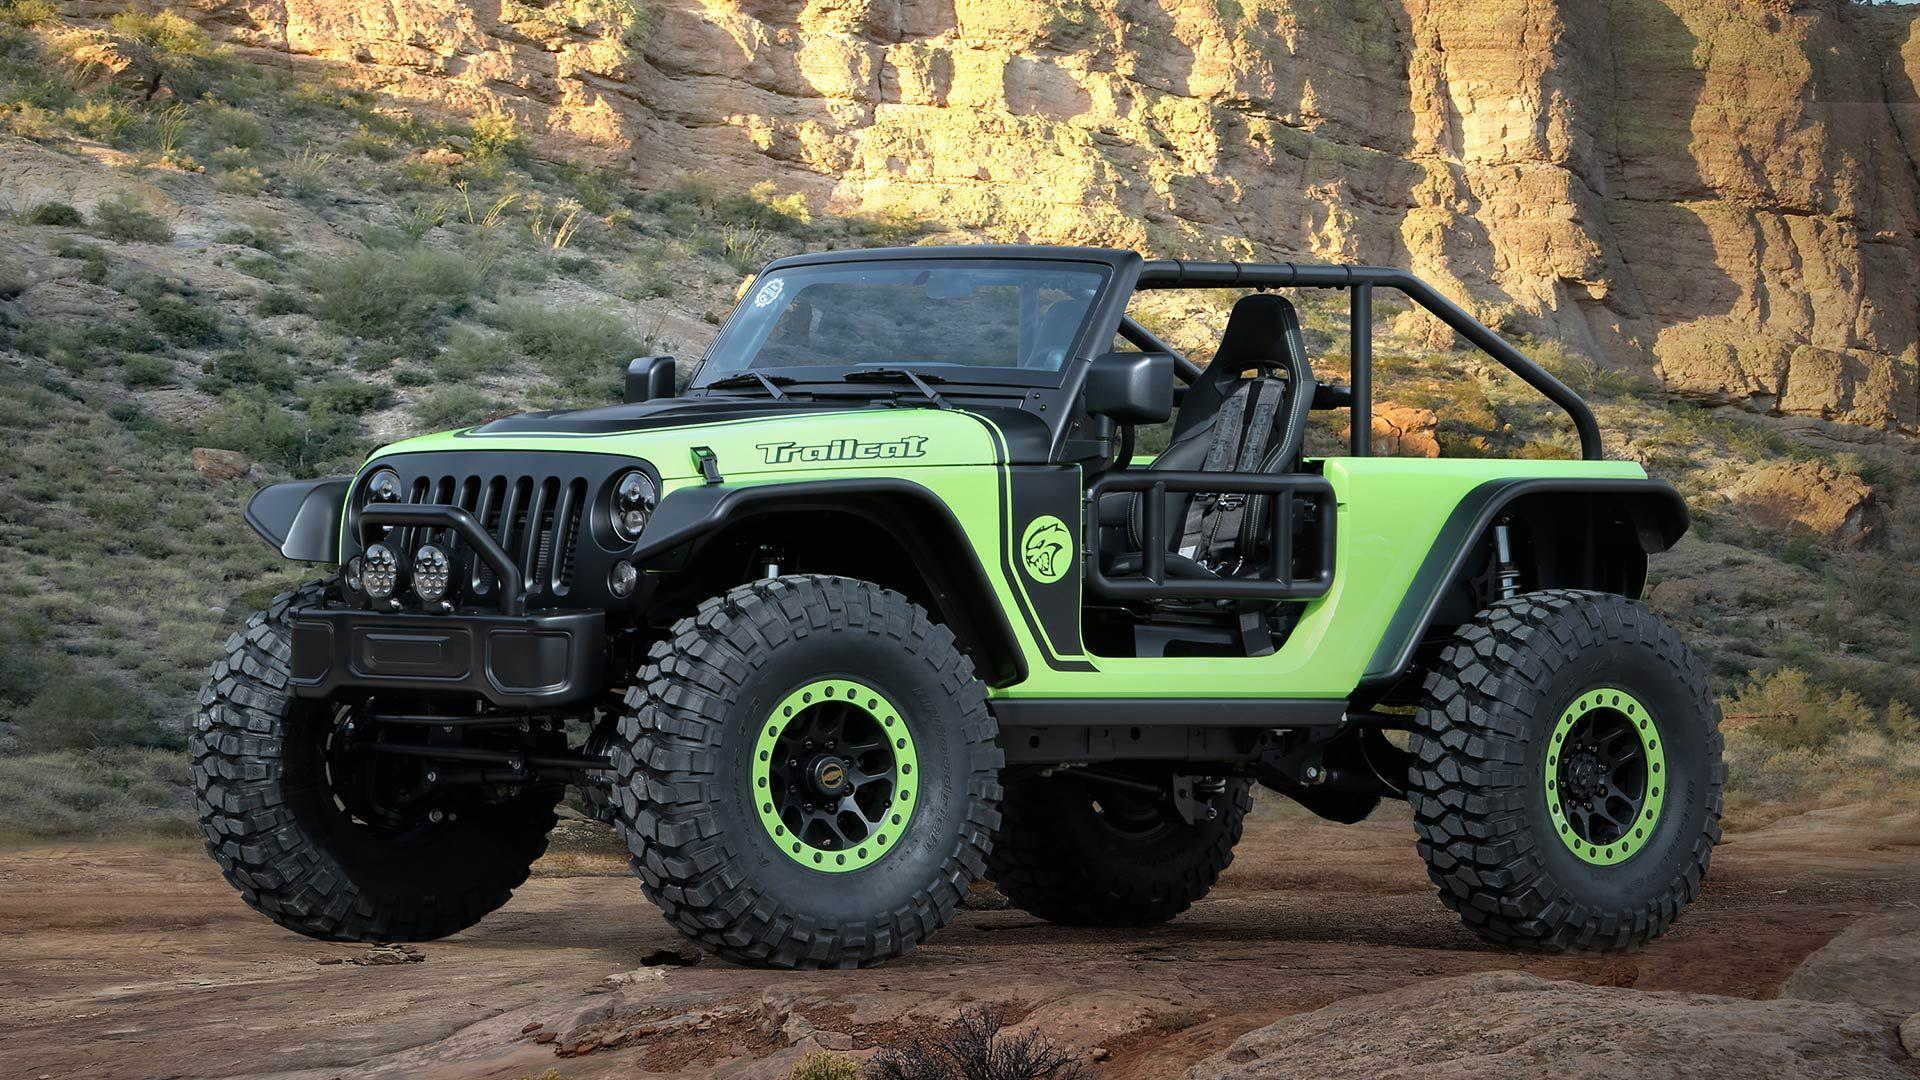 Jeep Wrangler Trailcat Has Hellcat Engine Viper Seats Manual